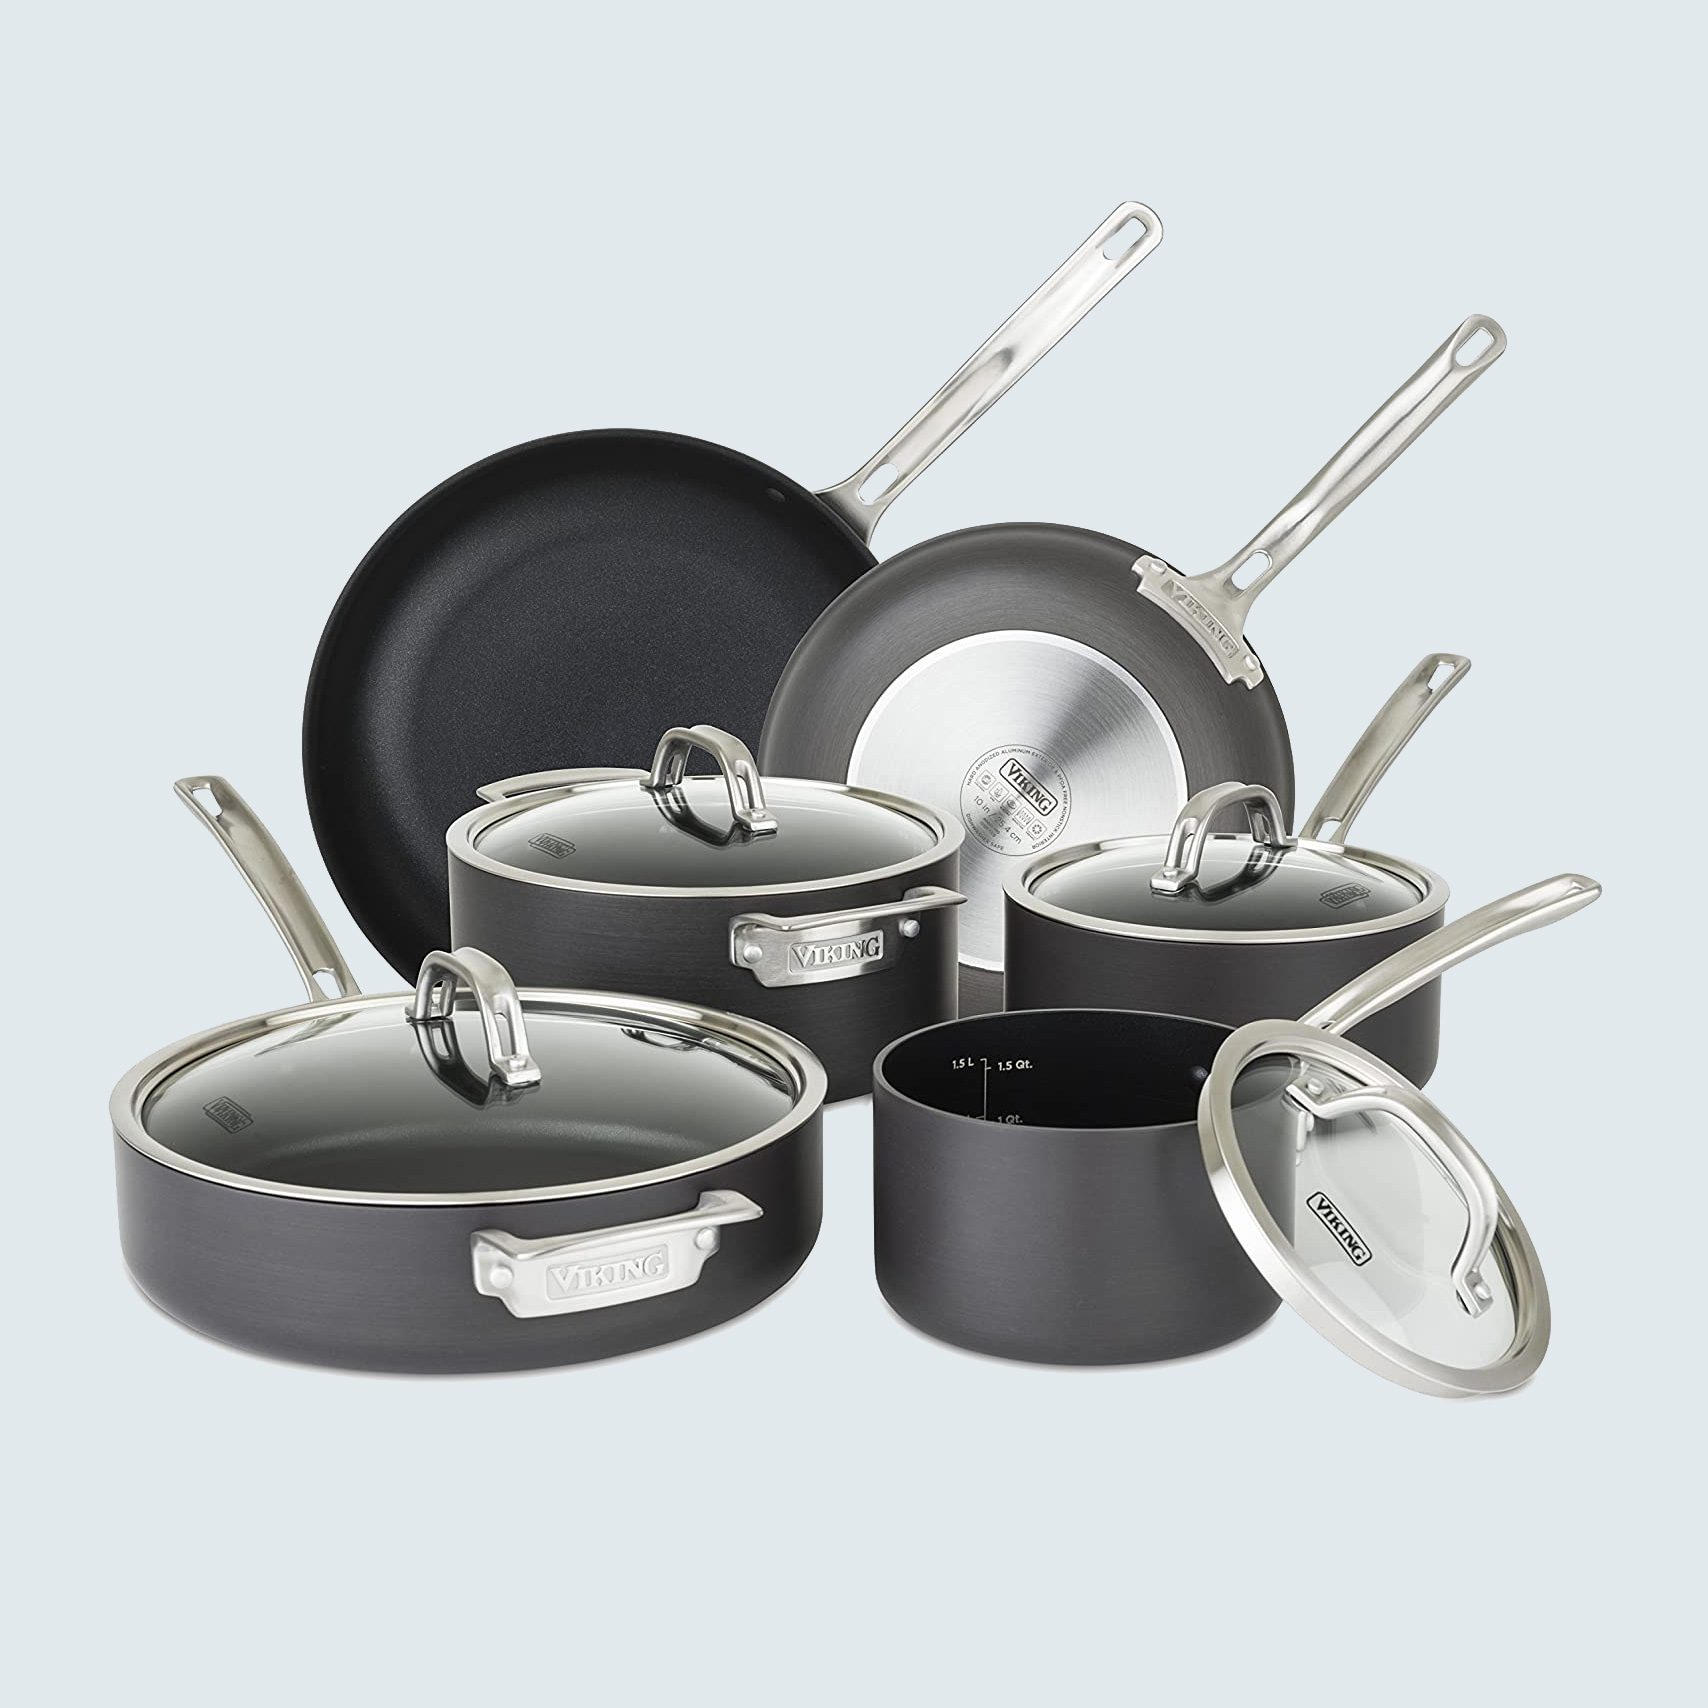 Viking Culinary Nonstick Cookware